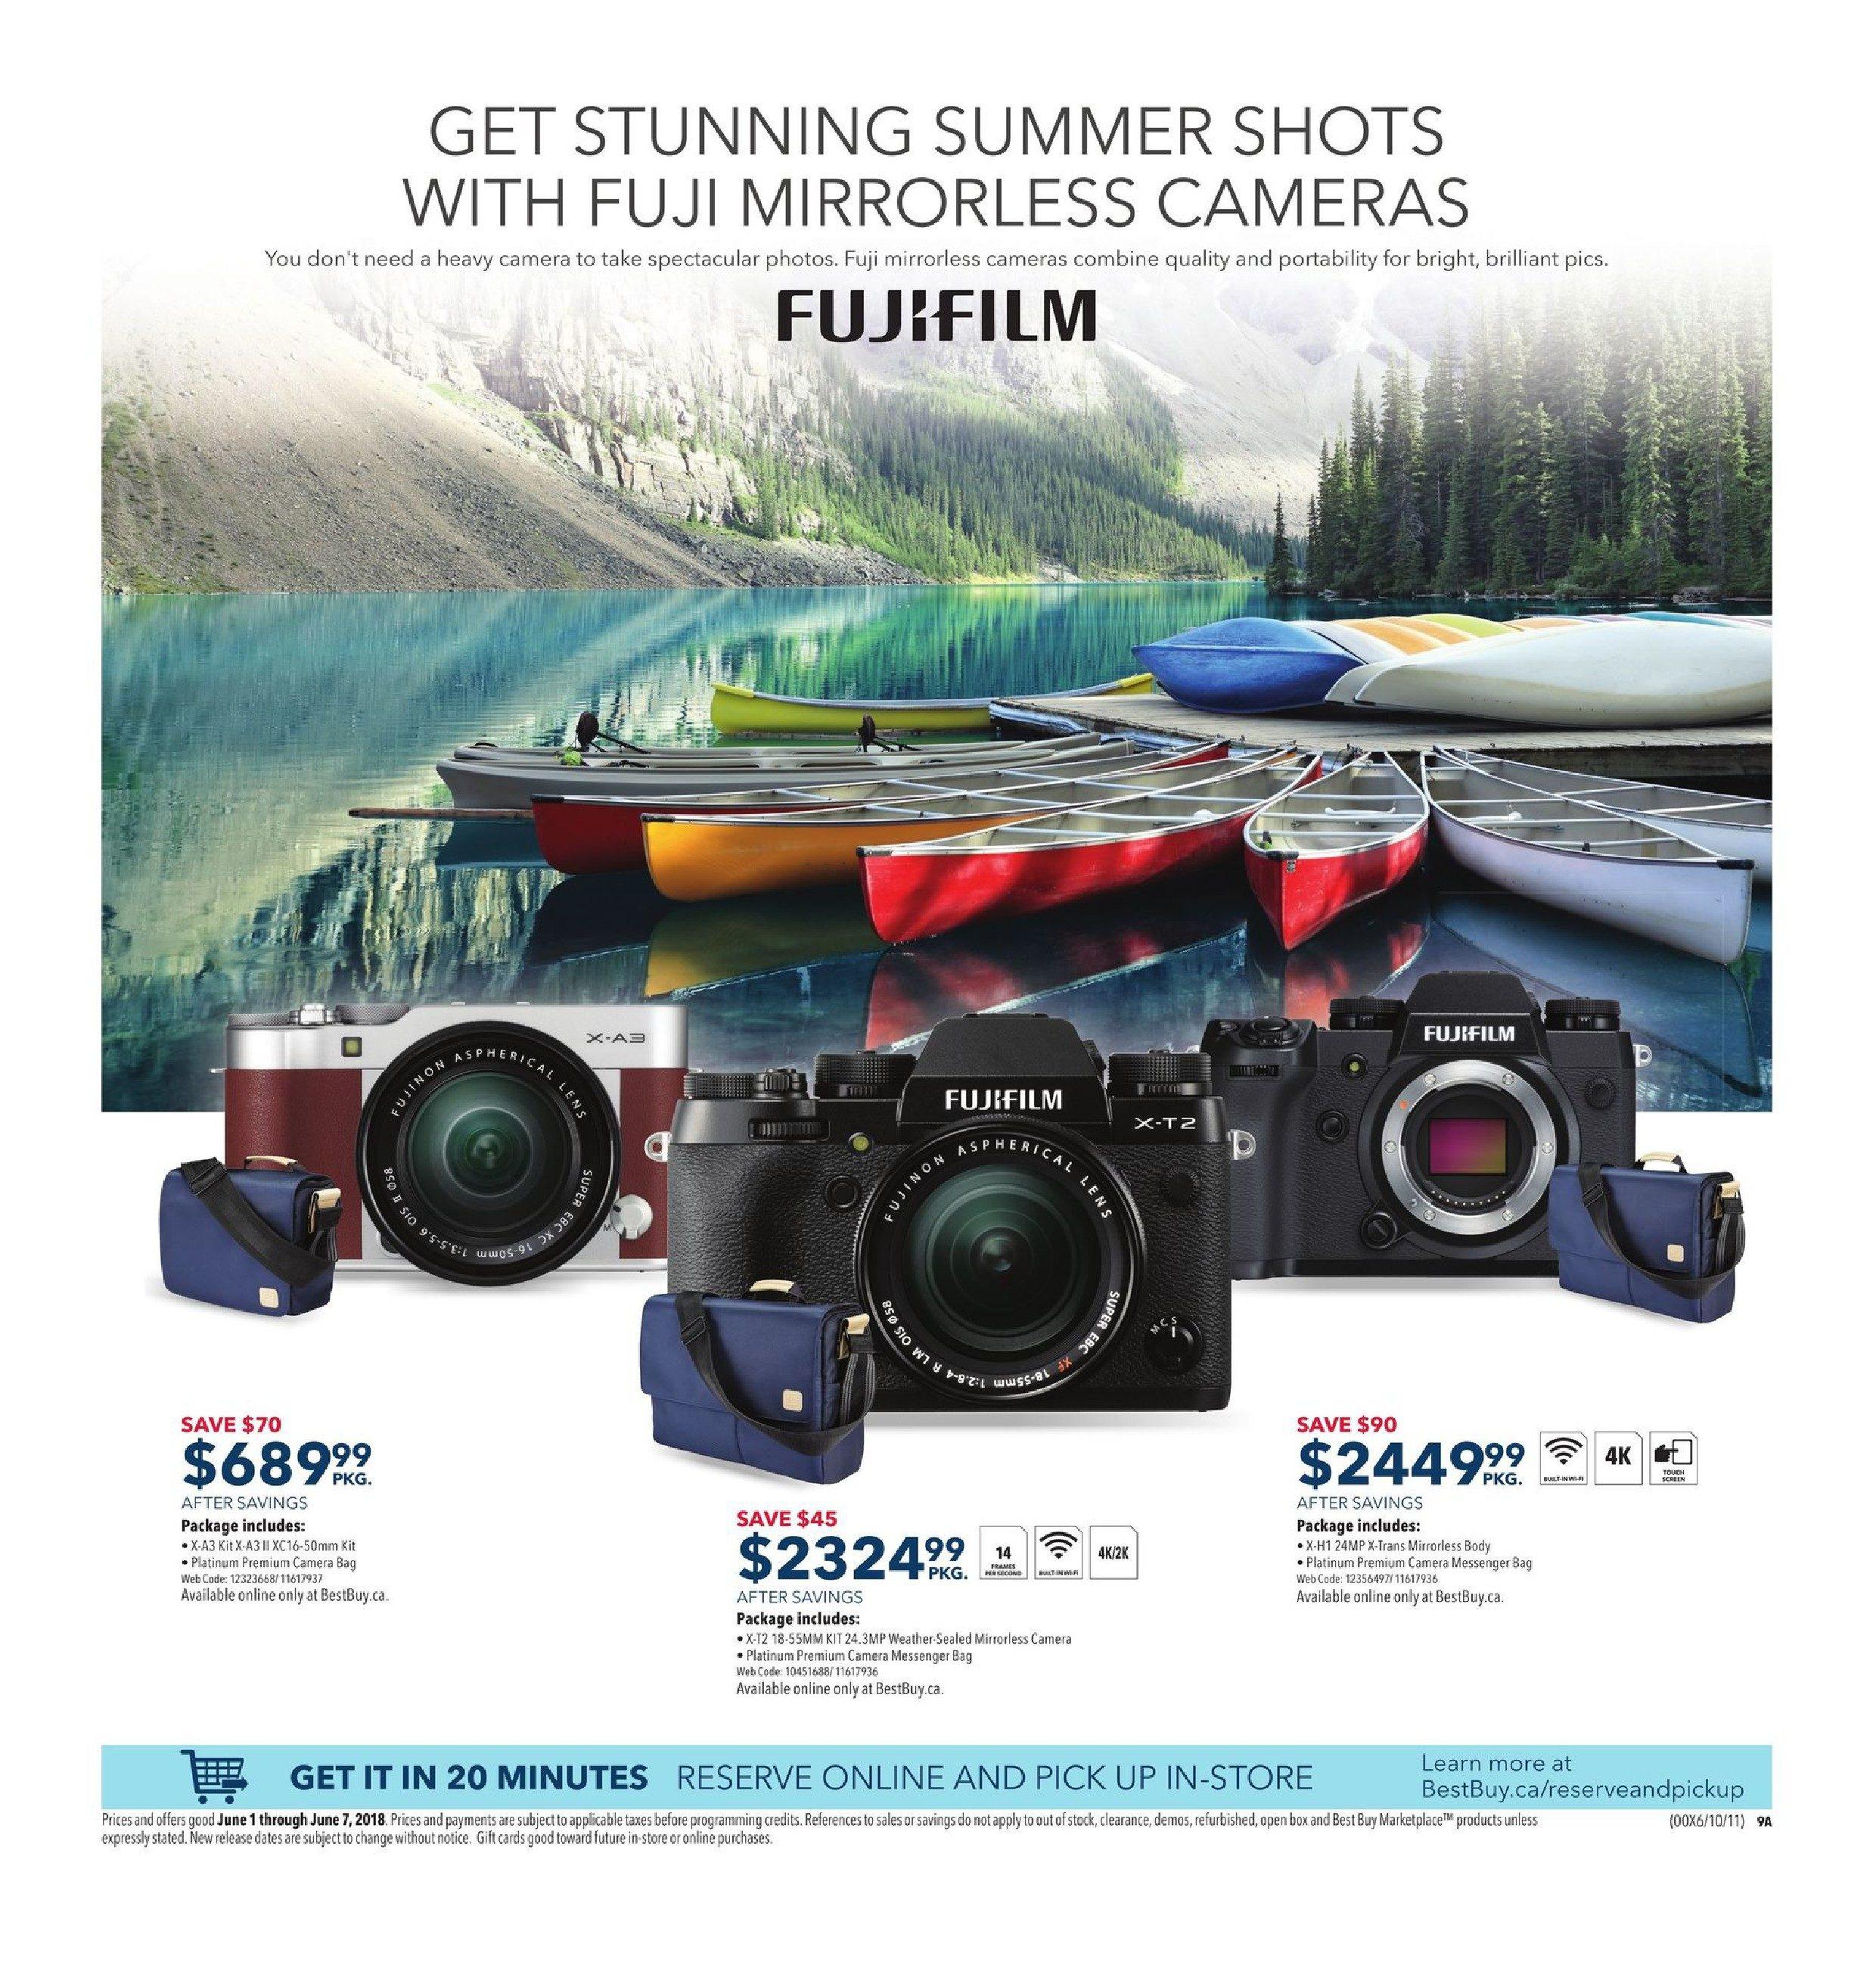 Jual Fujifilm X A3 Kit Xc 16 50mm Sd 16gb Silver Termurah 2018 Mini 8 Sd16gb Hitam Best Buy Weekly Flyer Surf Amazing Deals Jun 1 7